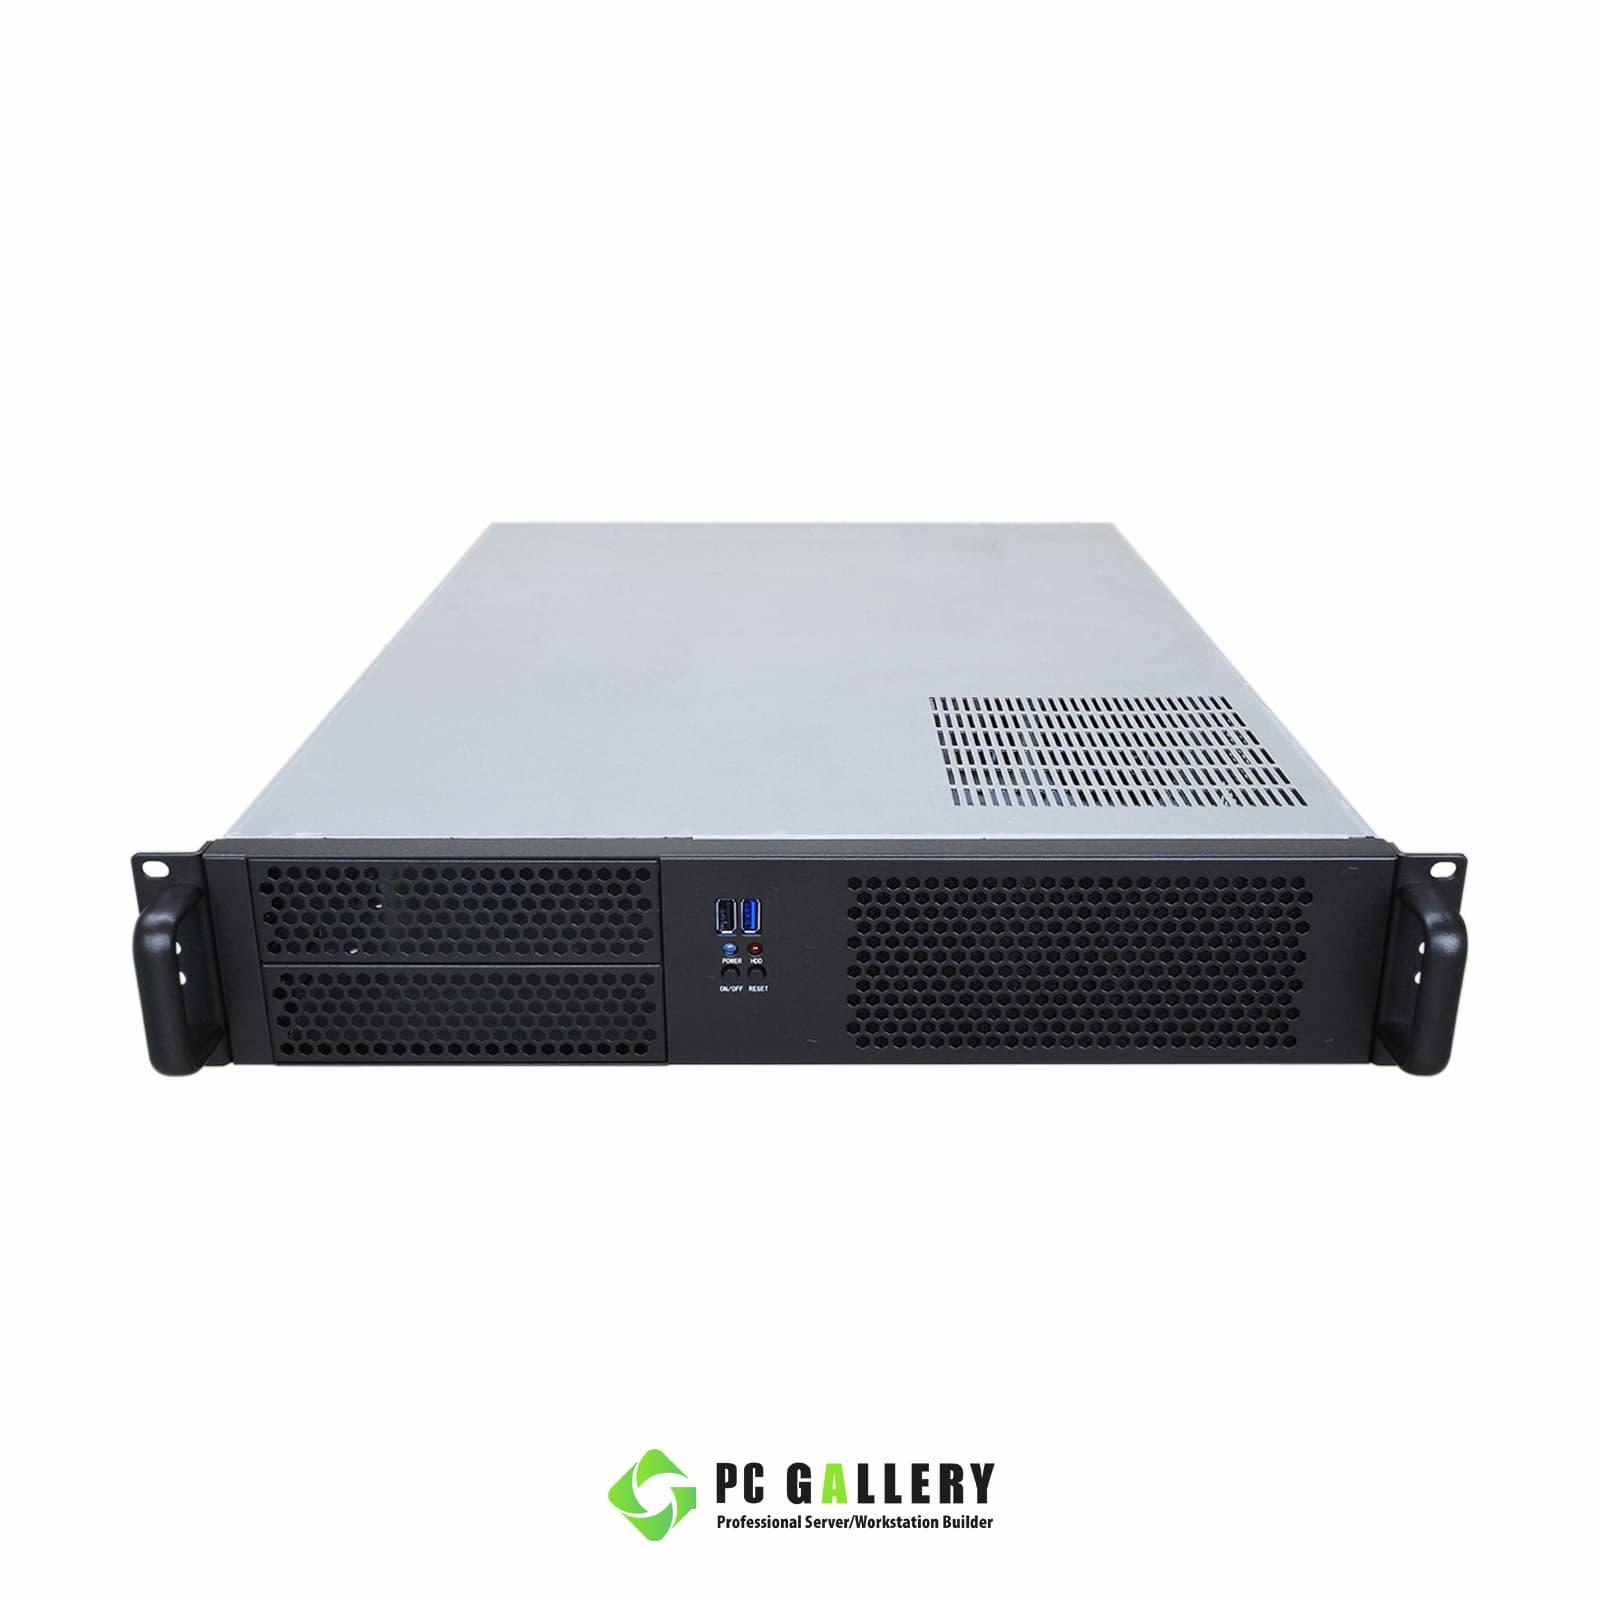 TGC-24550-3.0-01